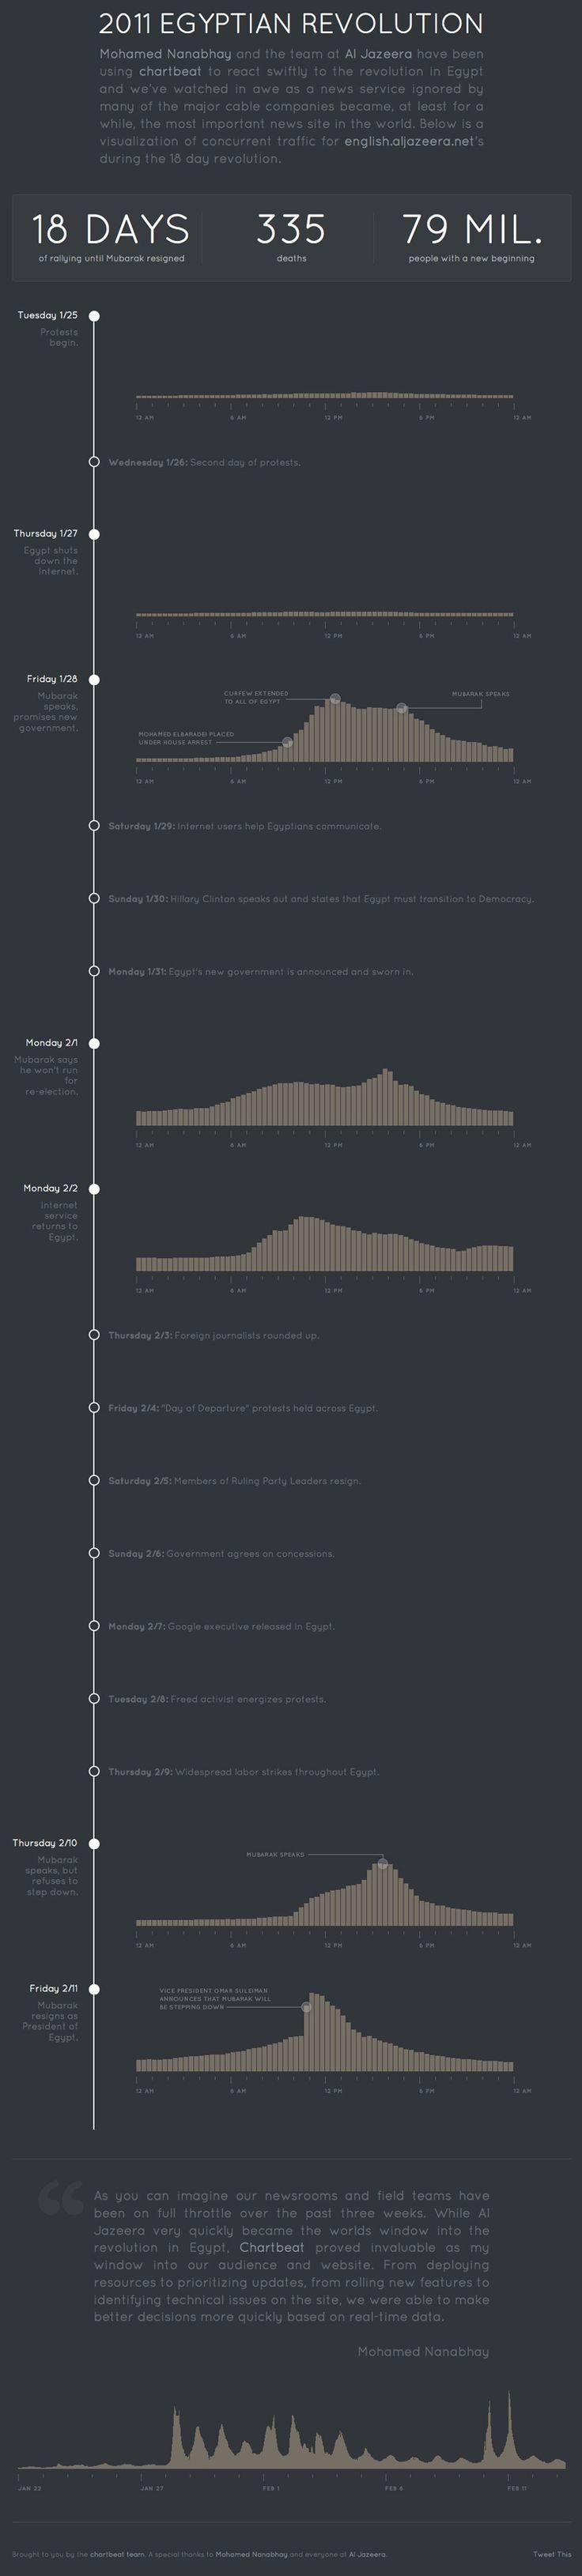 internet timeline of the Egyptian uprising